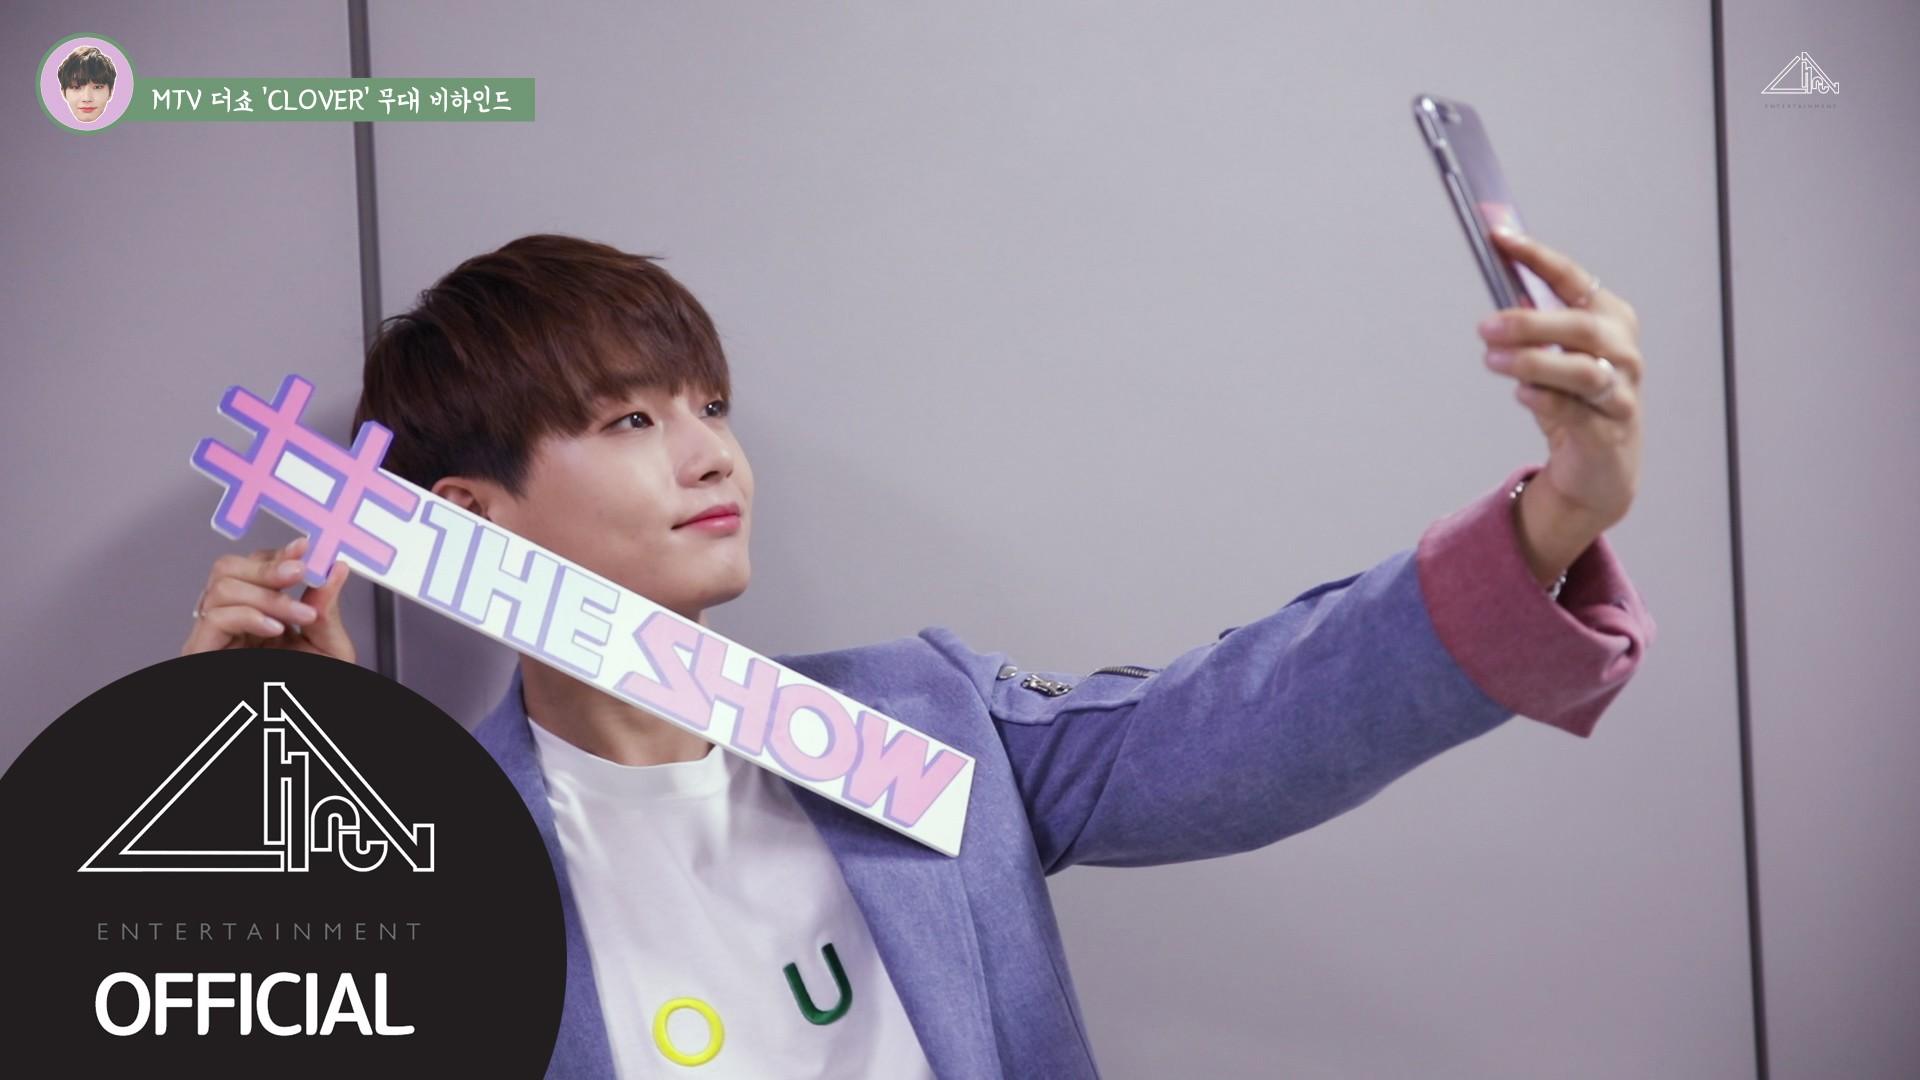 [BEHIND] 용국(LONGGUO) MTV 더쇼 'CLOVER' 무대 비하인드